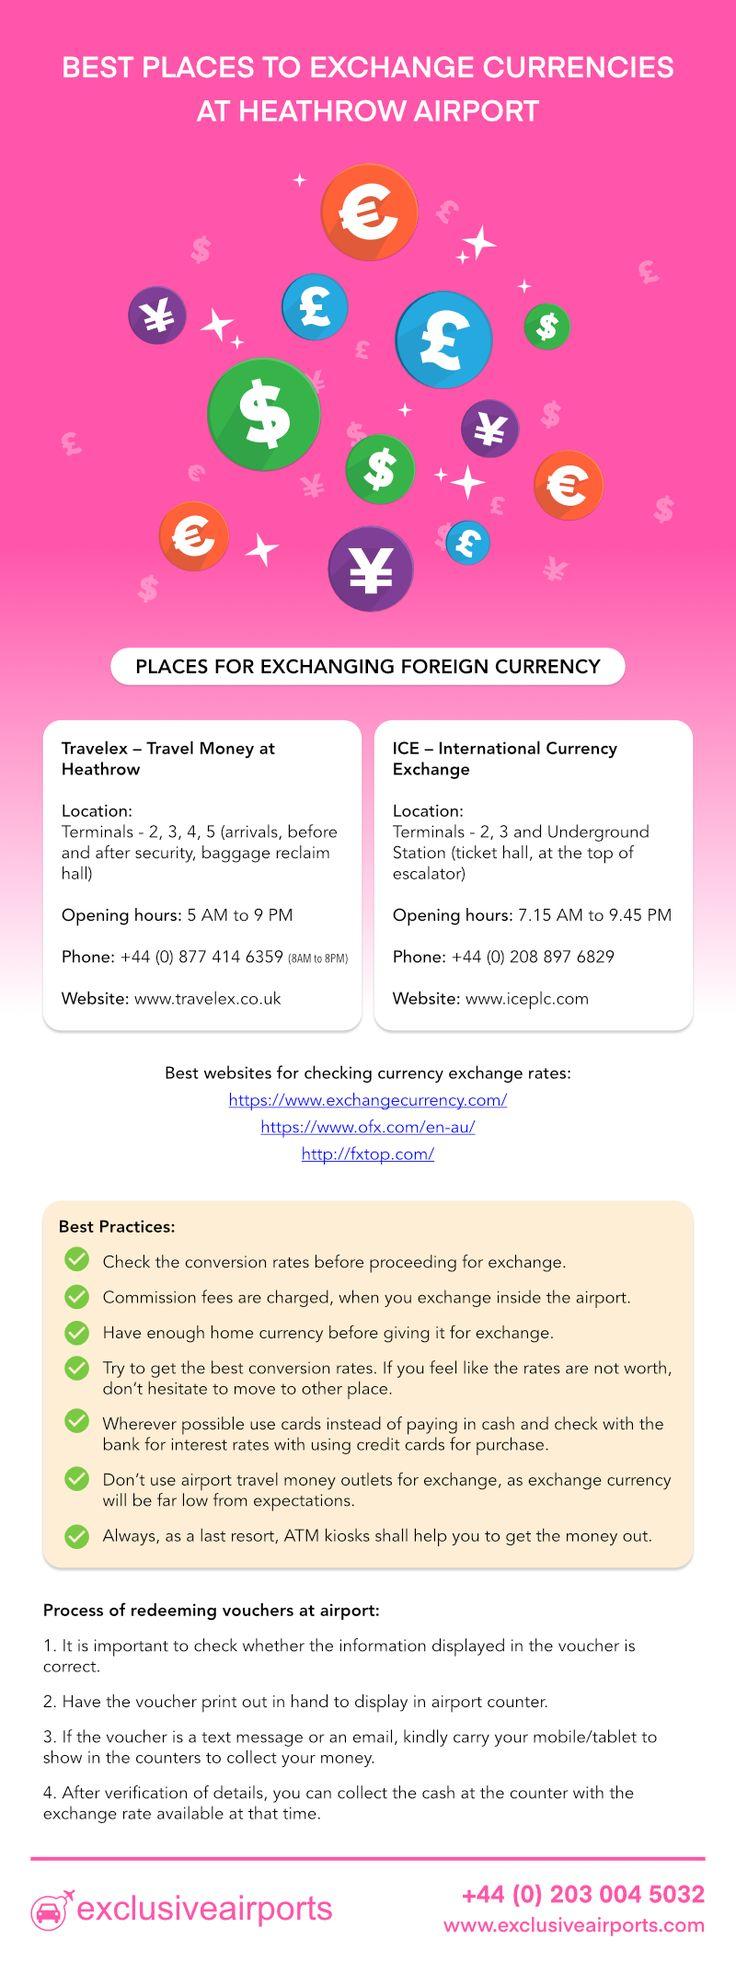 Best Places to Exchange Currencies at #HeathrowAirport.